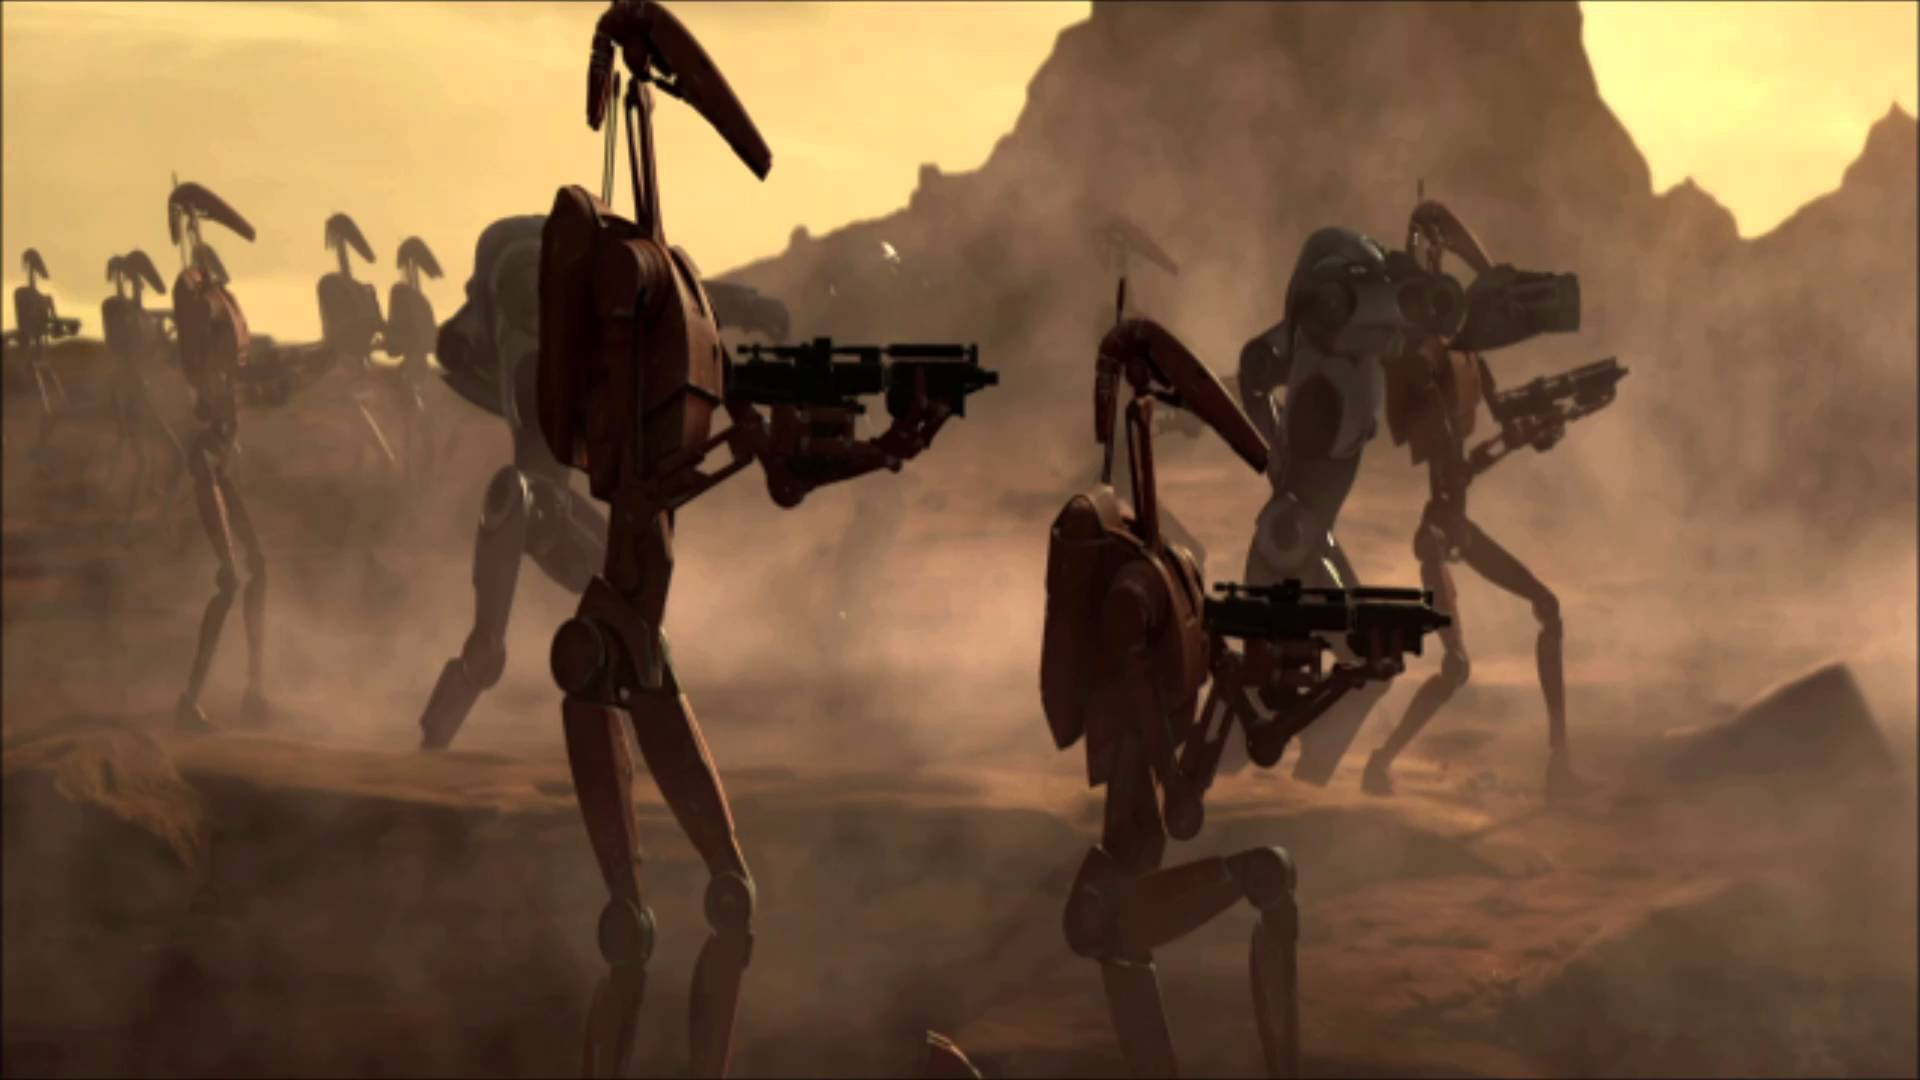 Battle Droid Wallpapers Wallpaper Cave